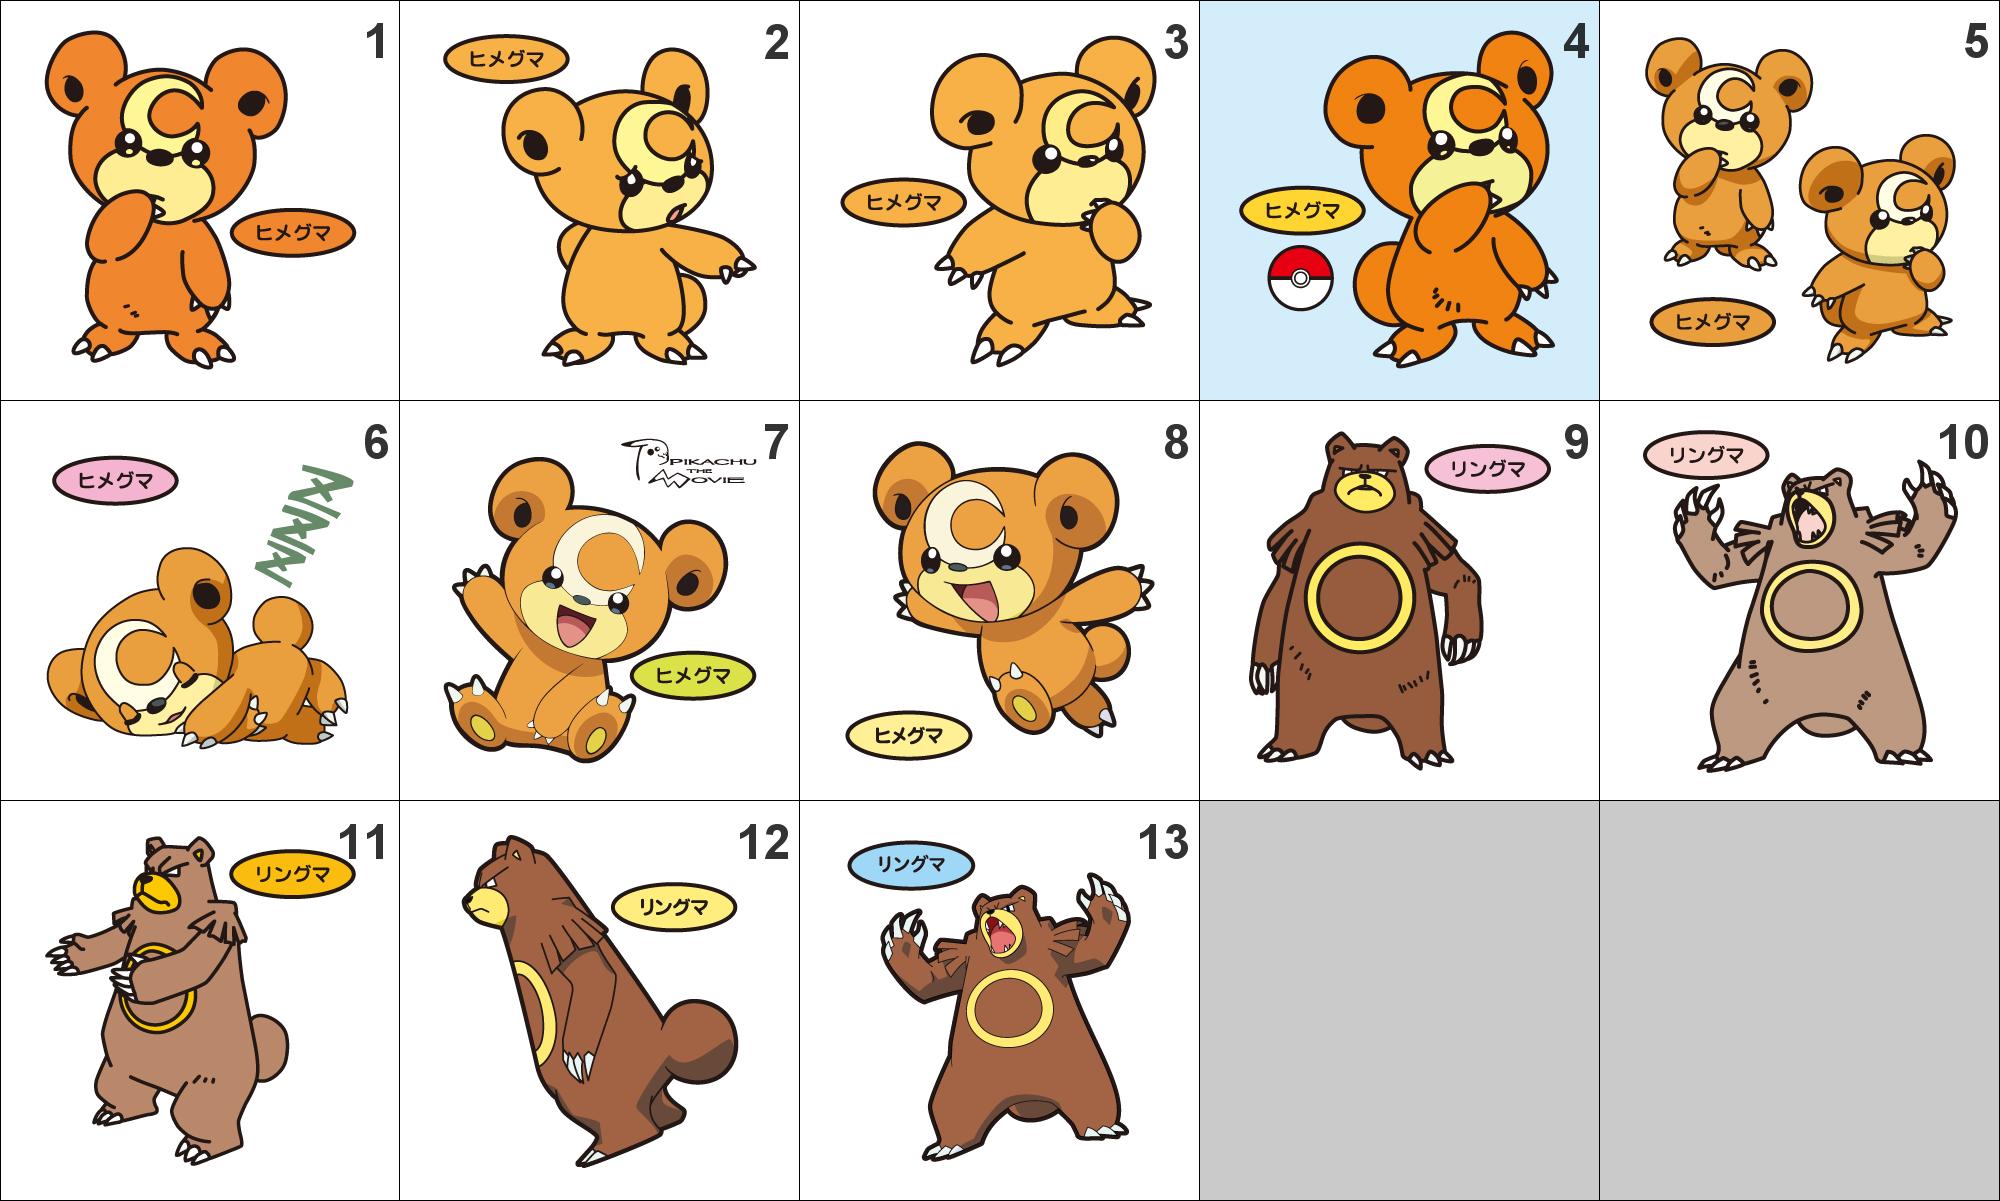 216, 217 Teddiursa, Ursaring Pan Stickers Pokemon on Storenvy  216, 217 Teddiu...